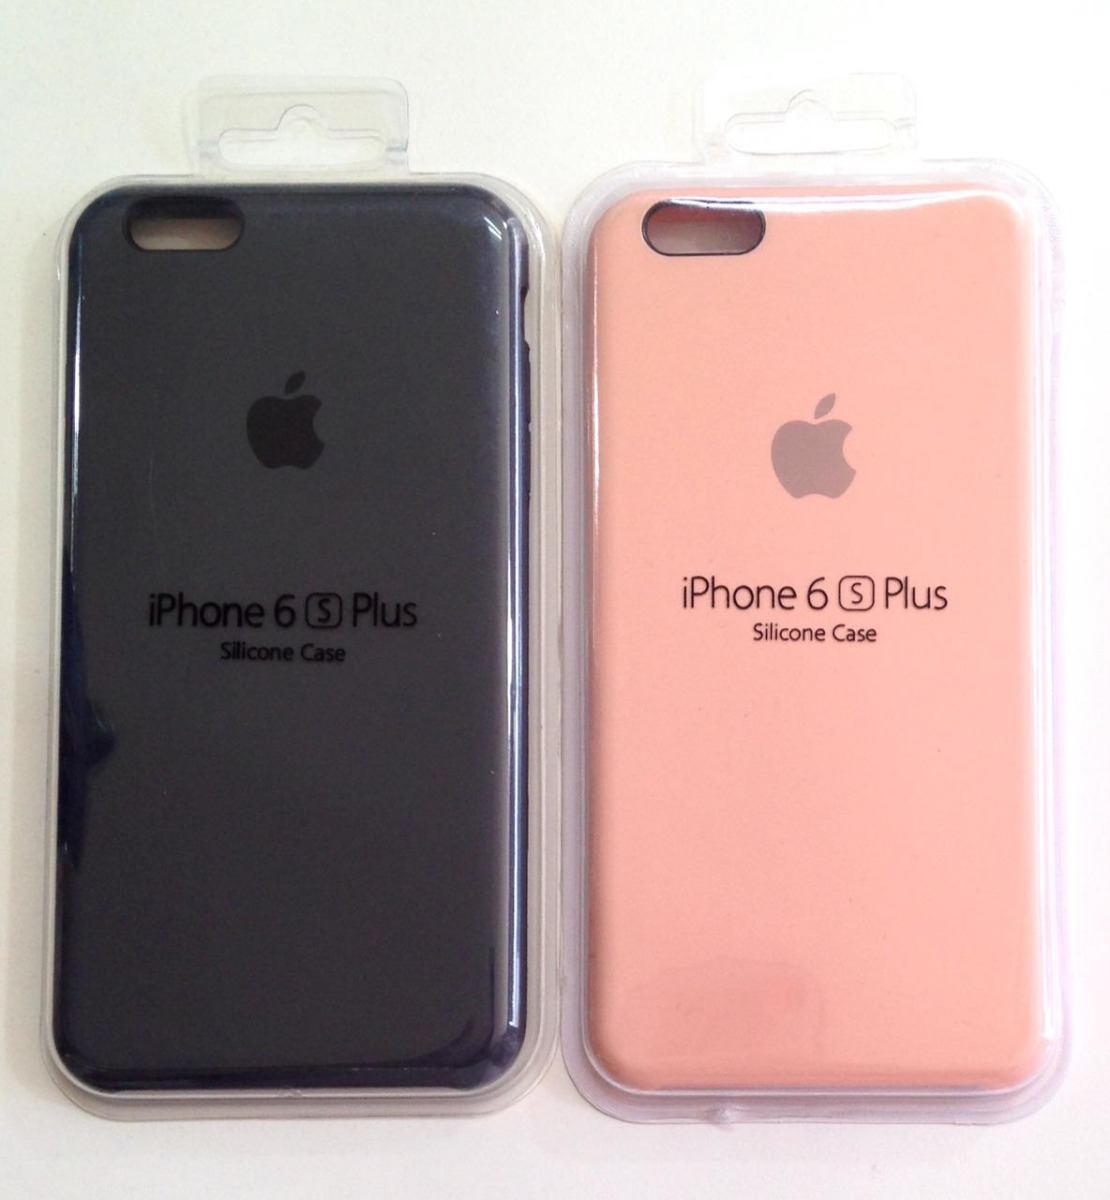 09c2727fb4a funda tpu protector iphone 6 plus - 6s plus silicone case. Cargando zoom.